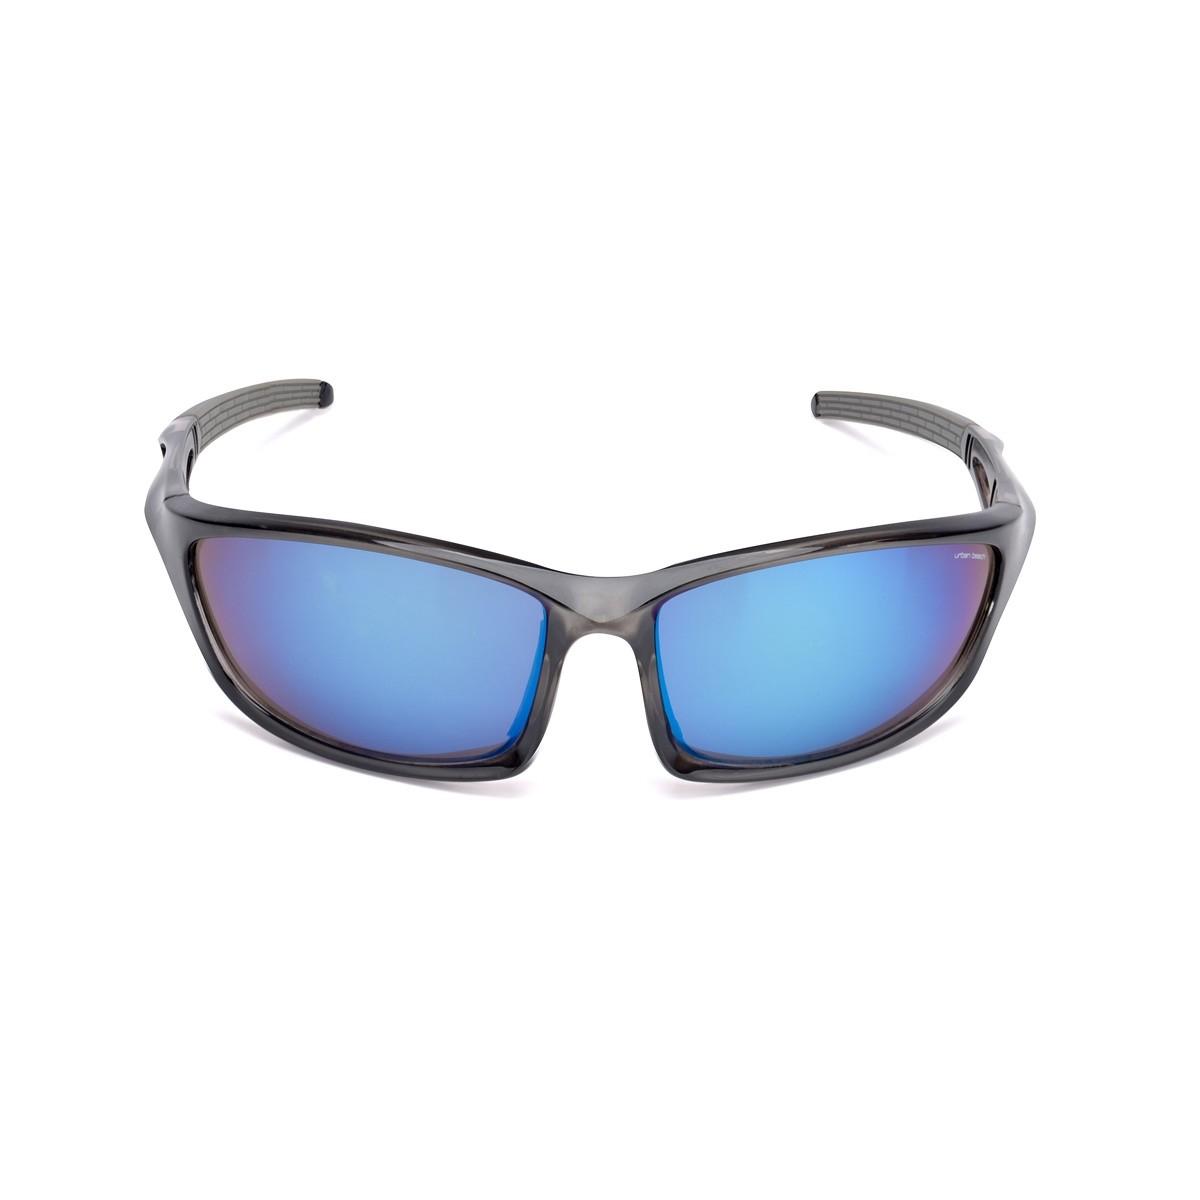 fb164f01d Mens Transition Wraparound Sunglasses Black - Sunglasses ...